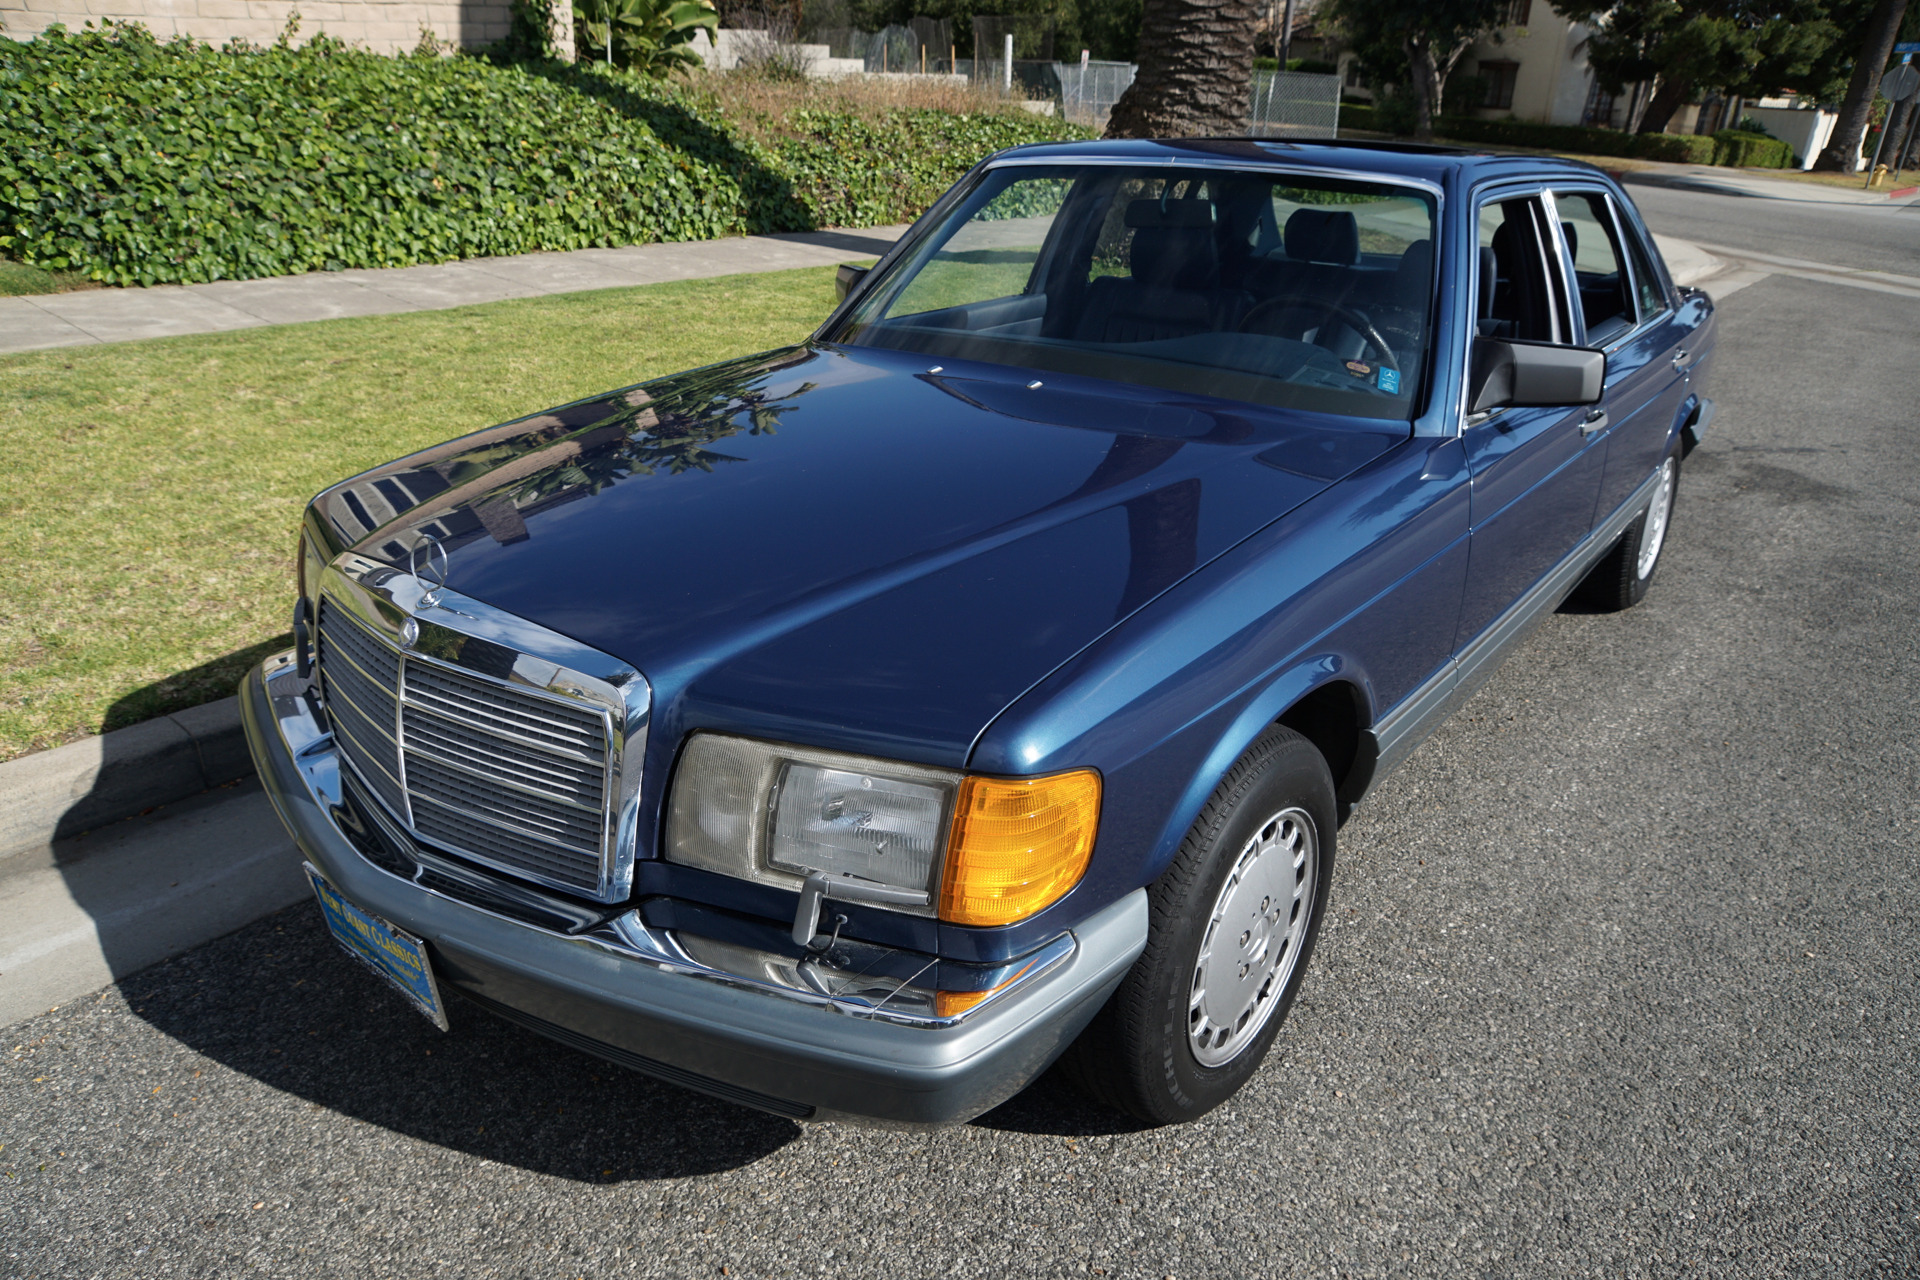 Photo 1986 Mercedes-Benz 300 SDL Turbo Diesel Sedan 300 SDL